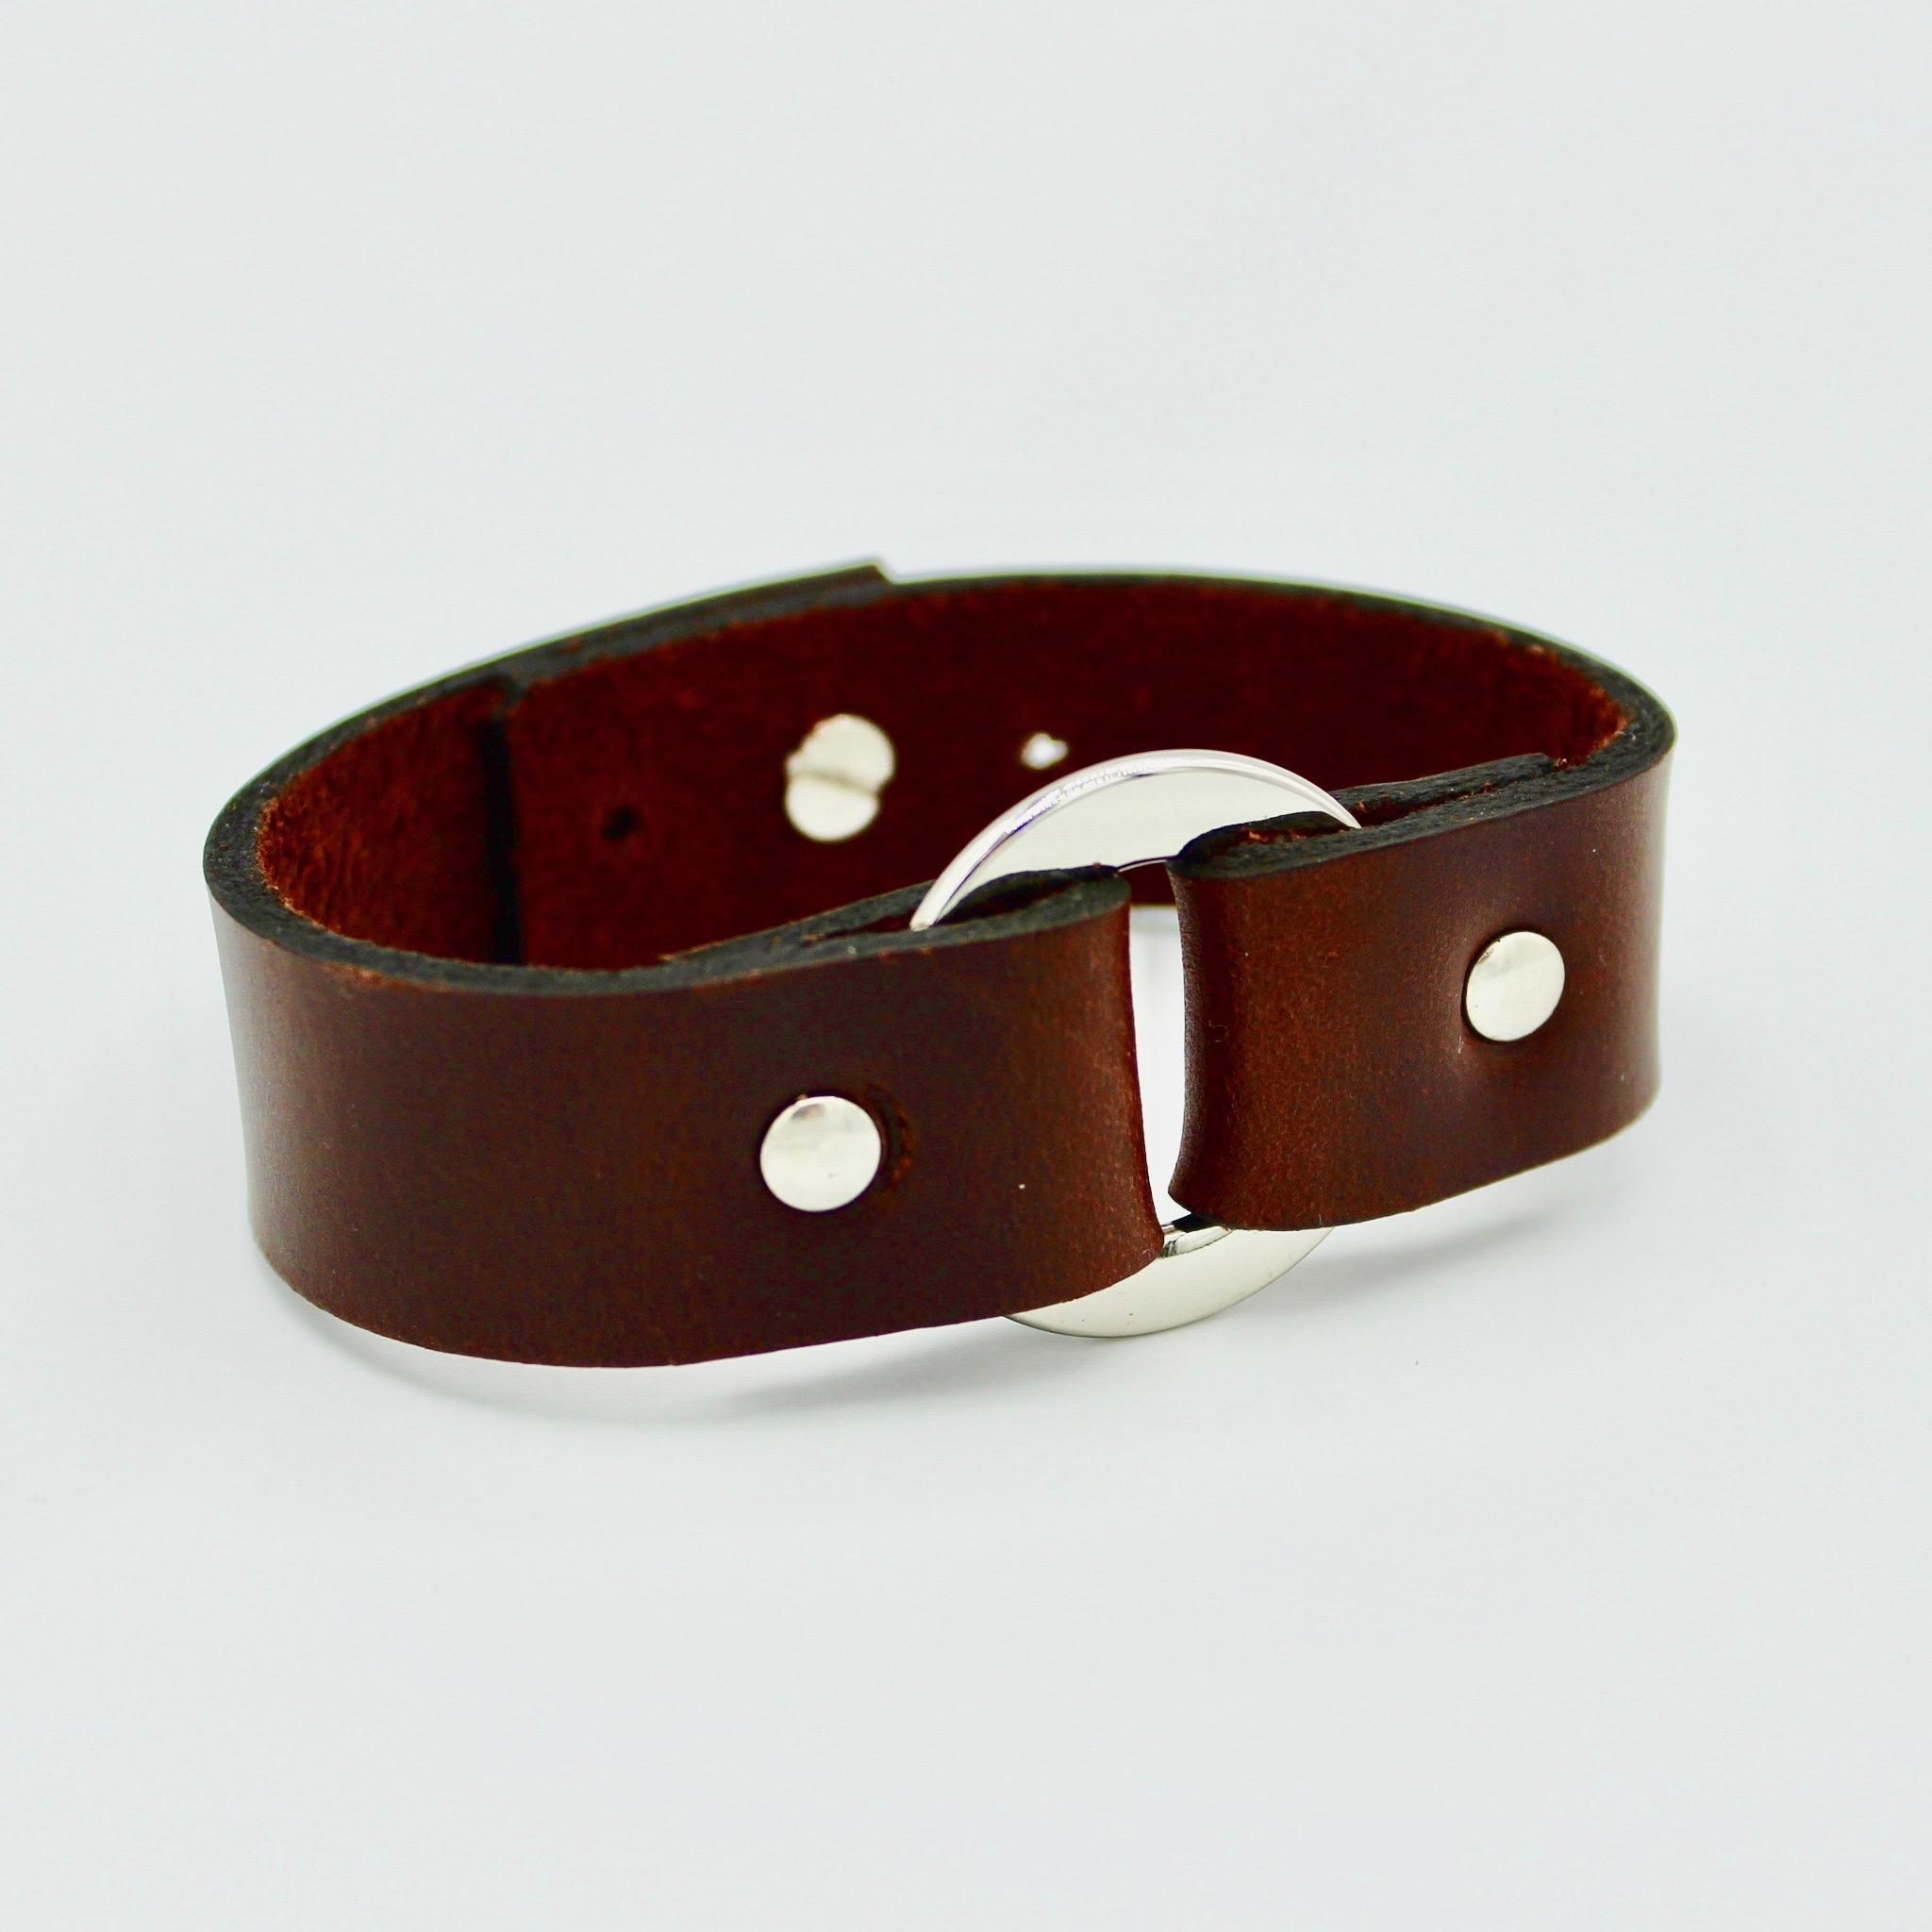 Unisex brown leather bracelet